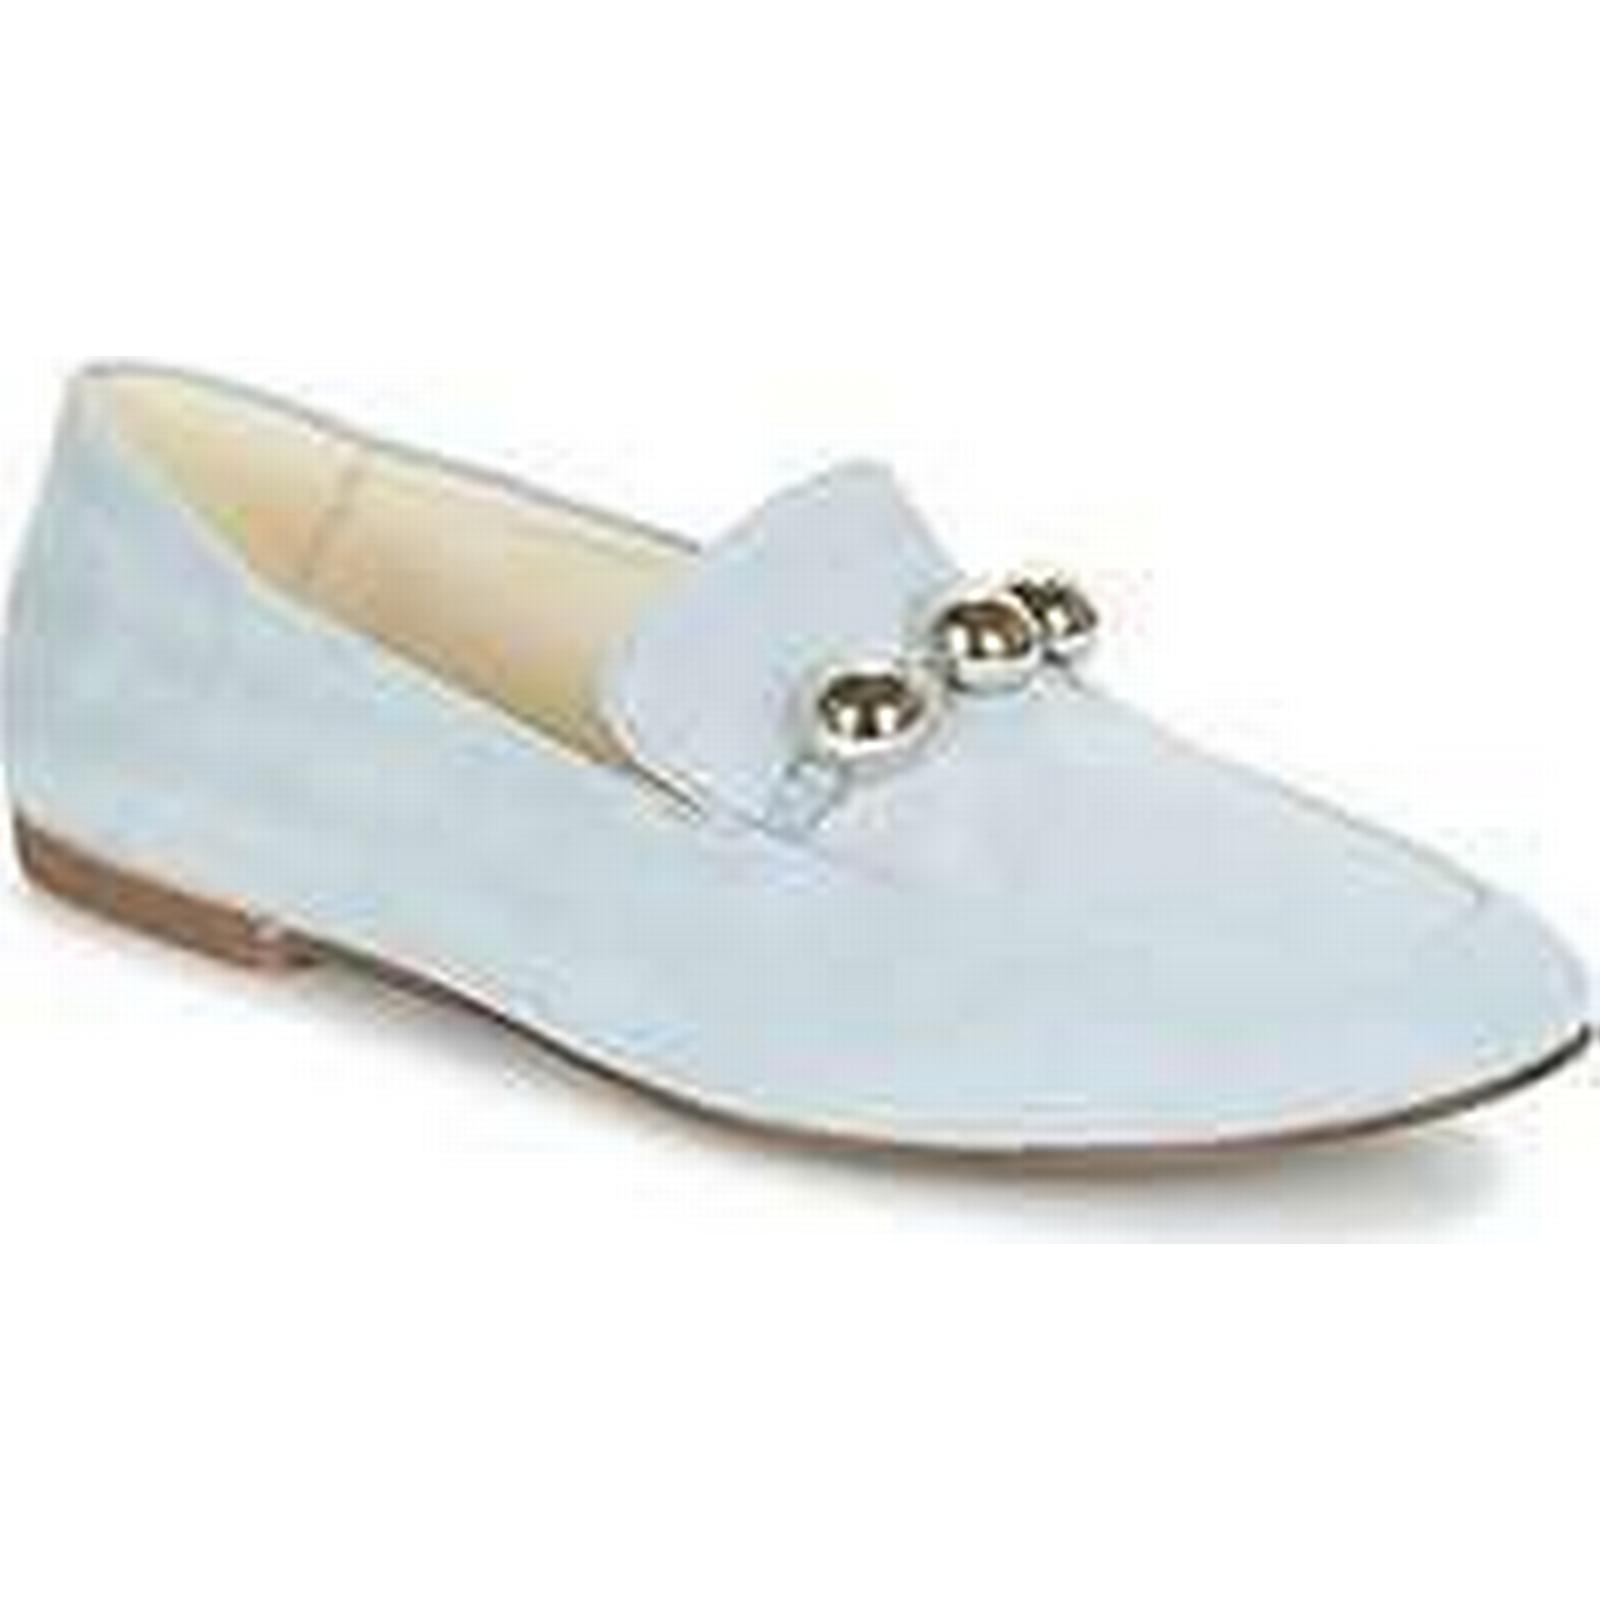 Spartoo.co.uk Vagabond AYDEN Shoes women's Loafers / Casual Shoes AYDEN in Grey 1681bd